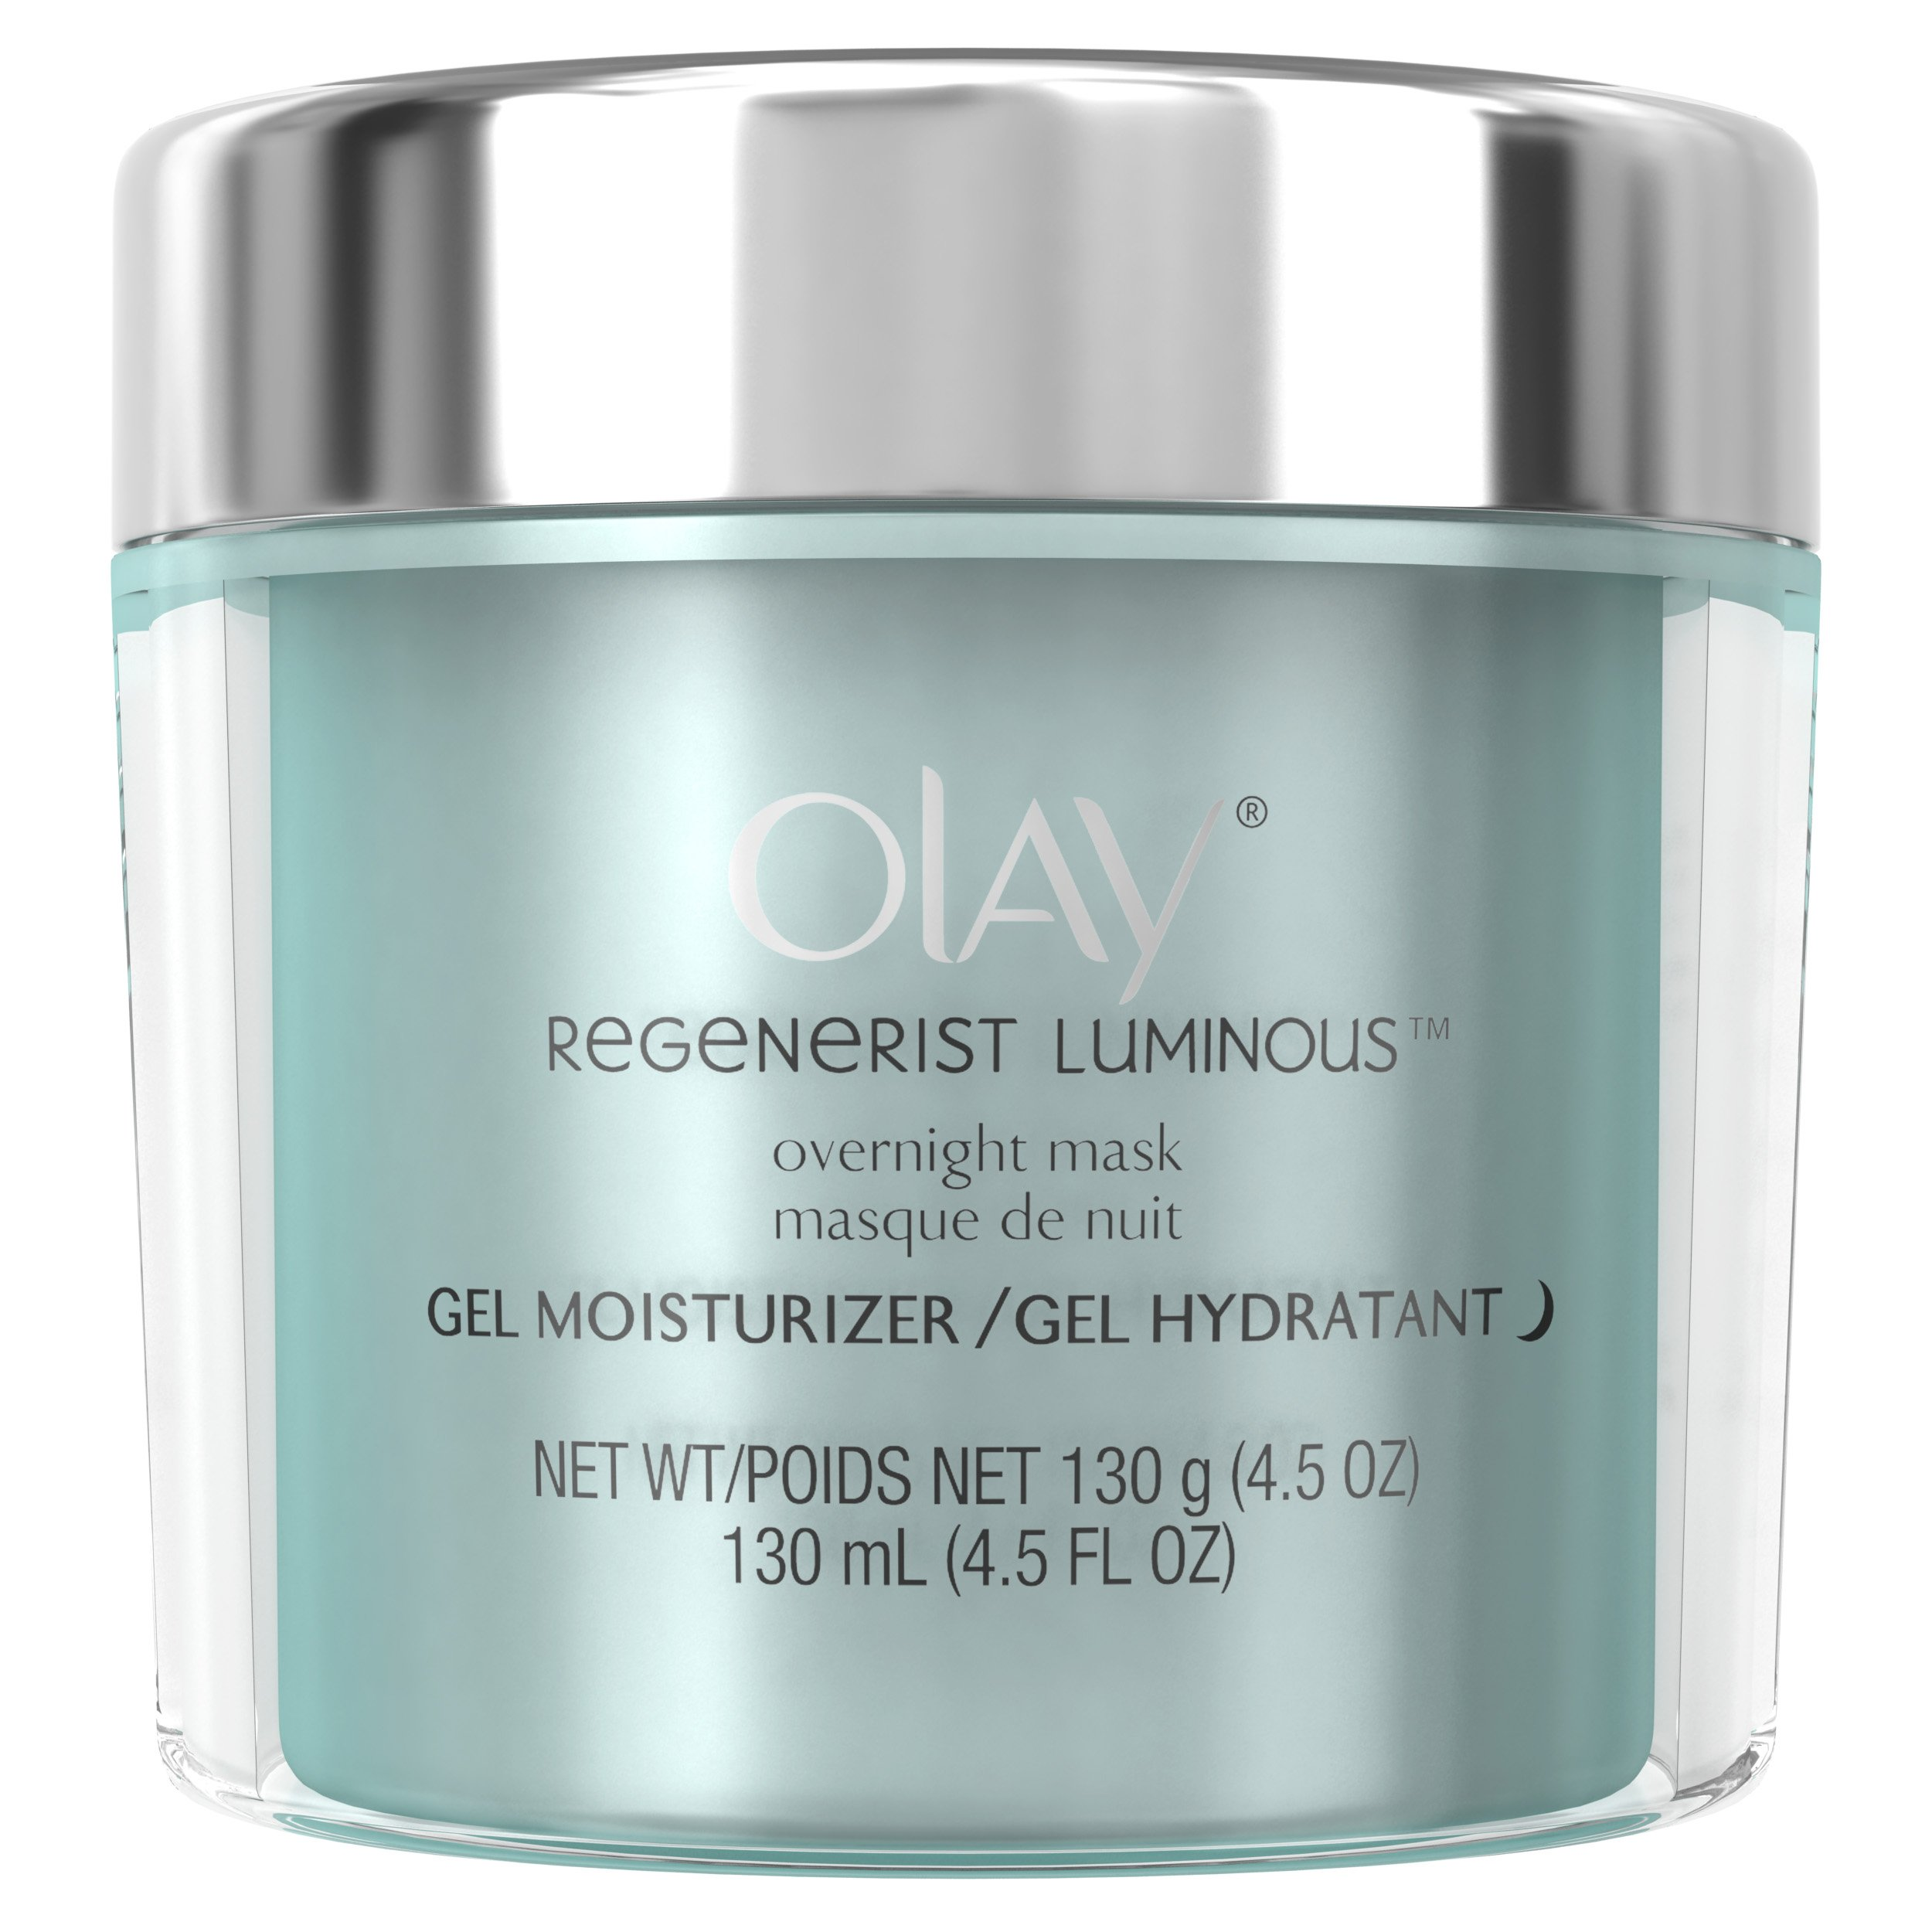 Olay Regenerist Luminous Overnight Facial Mask Gel Moisturizer, 4.5 oz Packaging may Vary